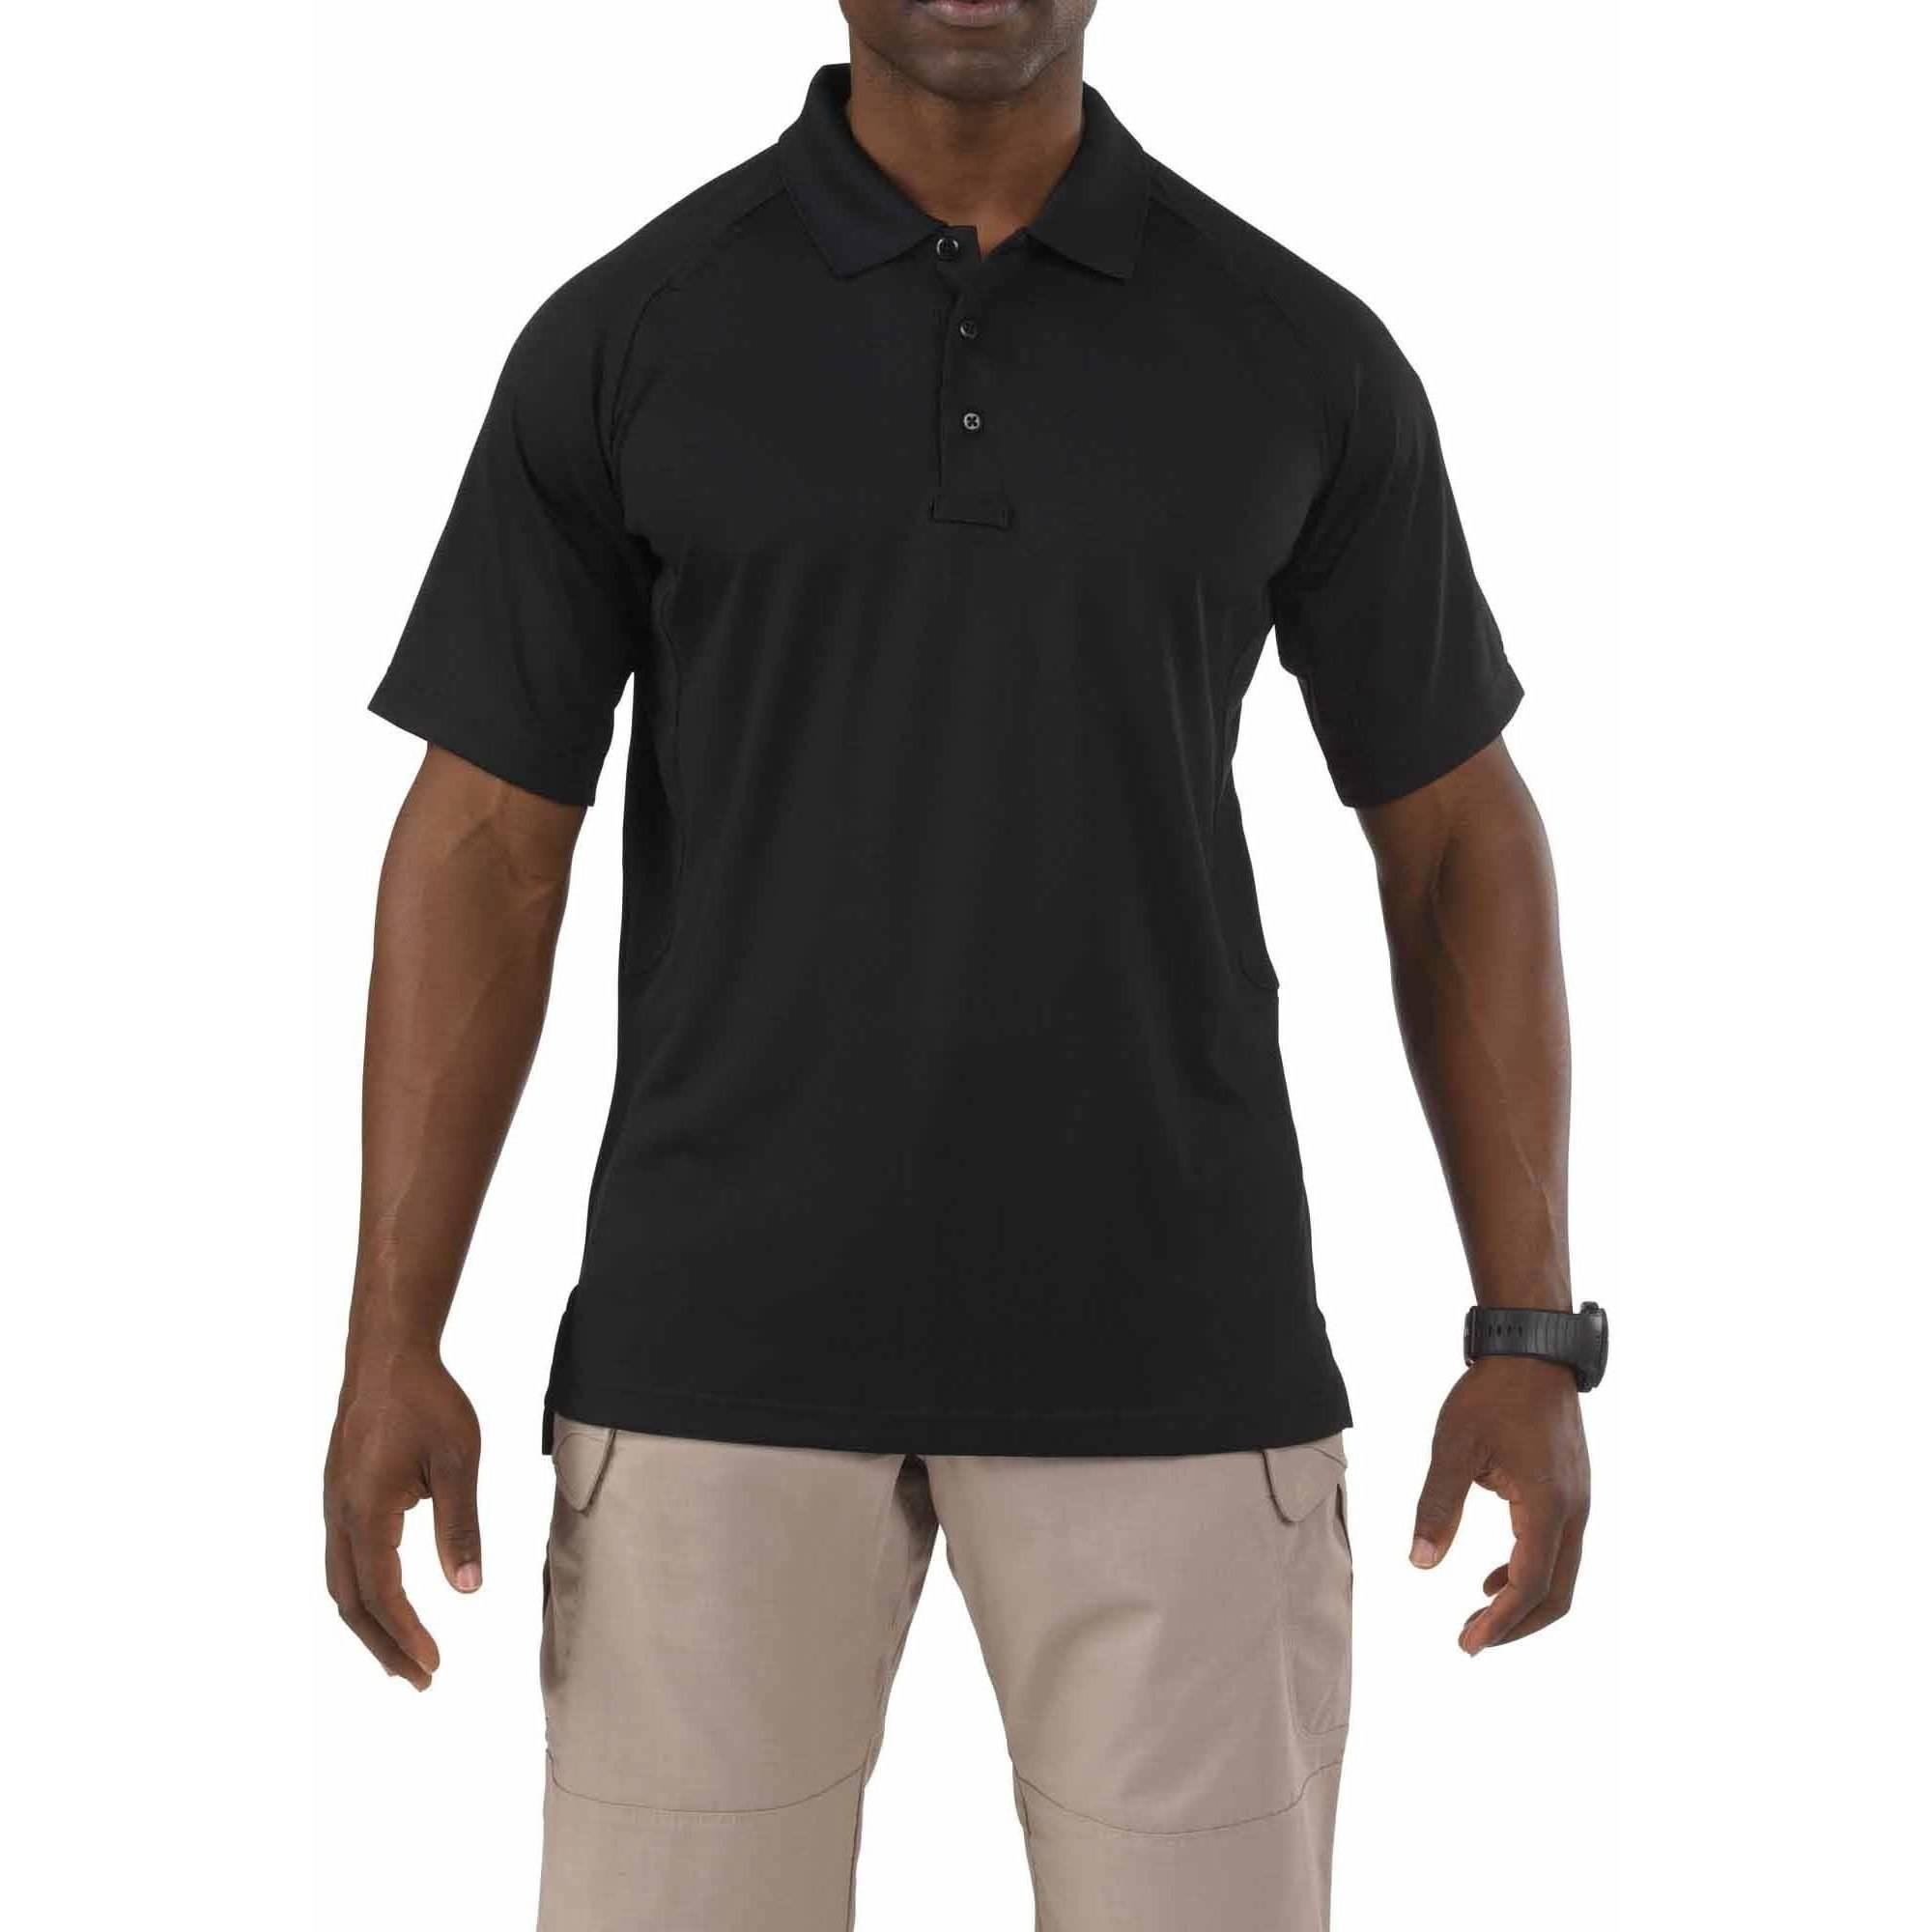 Performance Short Sleeve Polo Shirt, Black